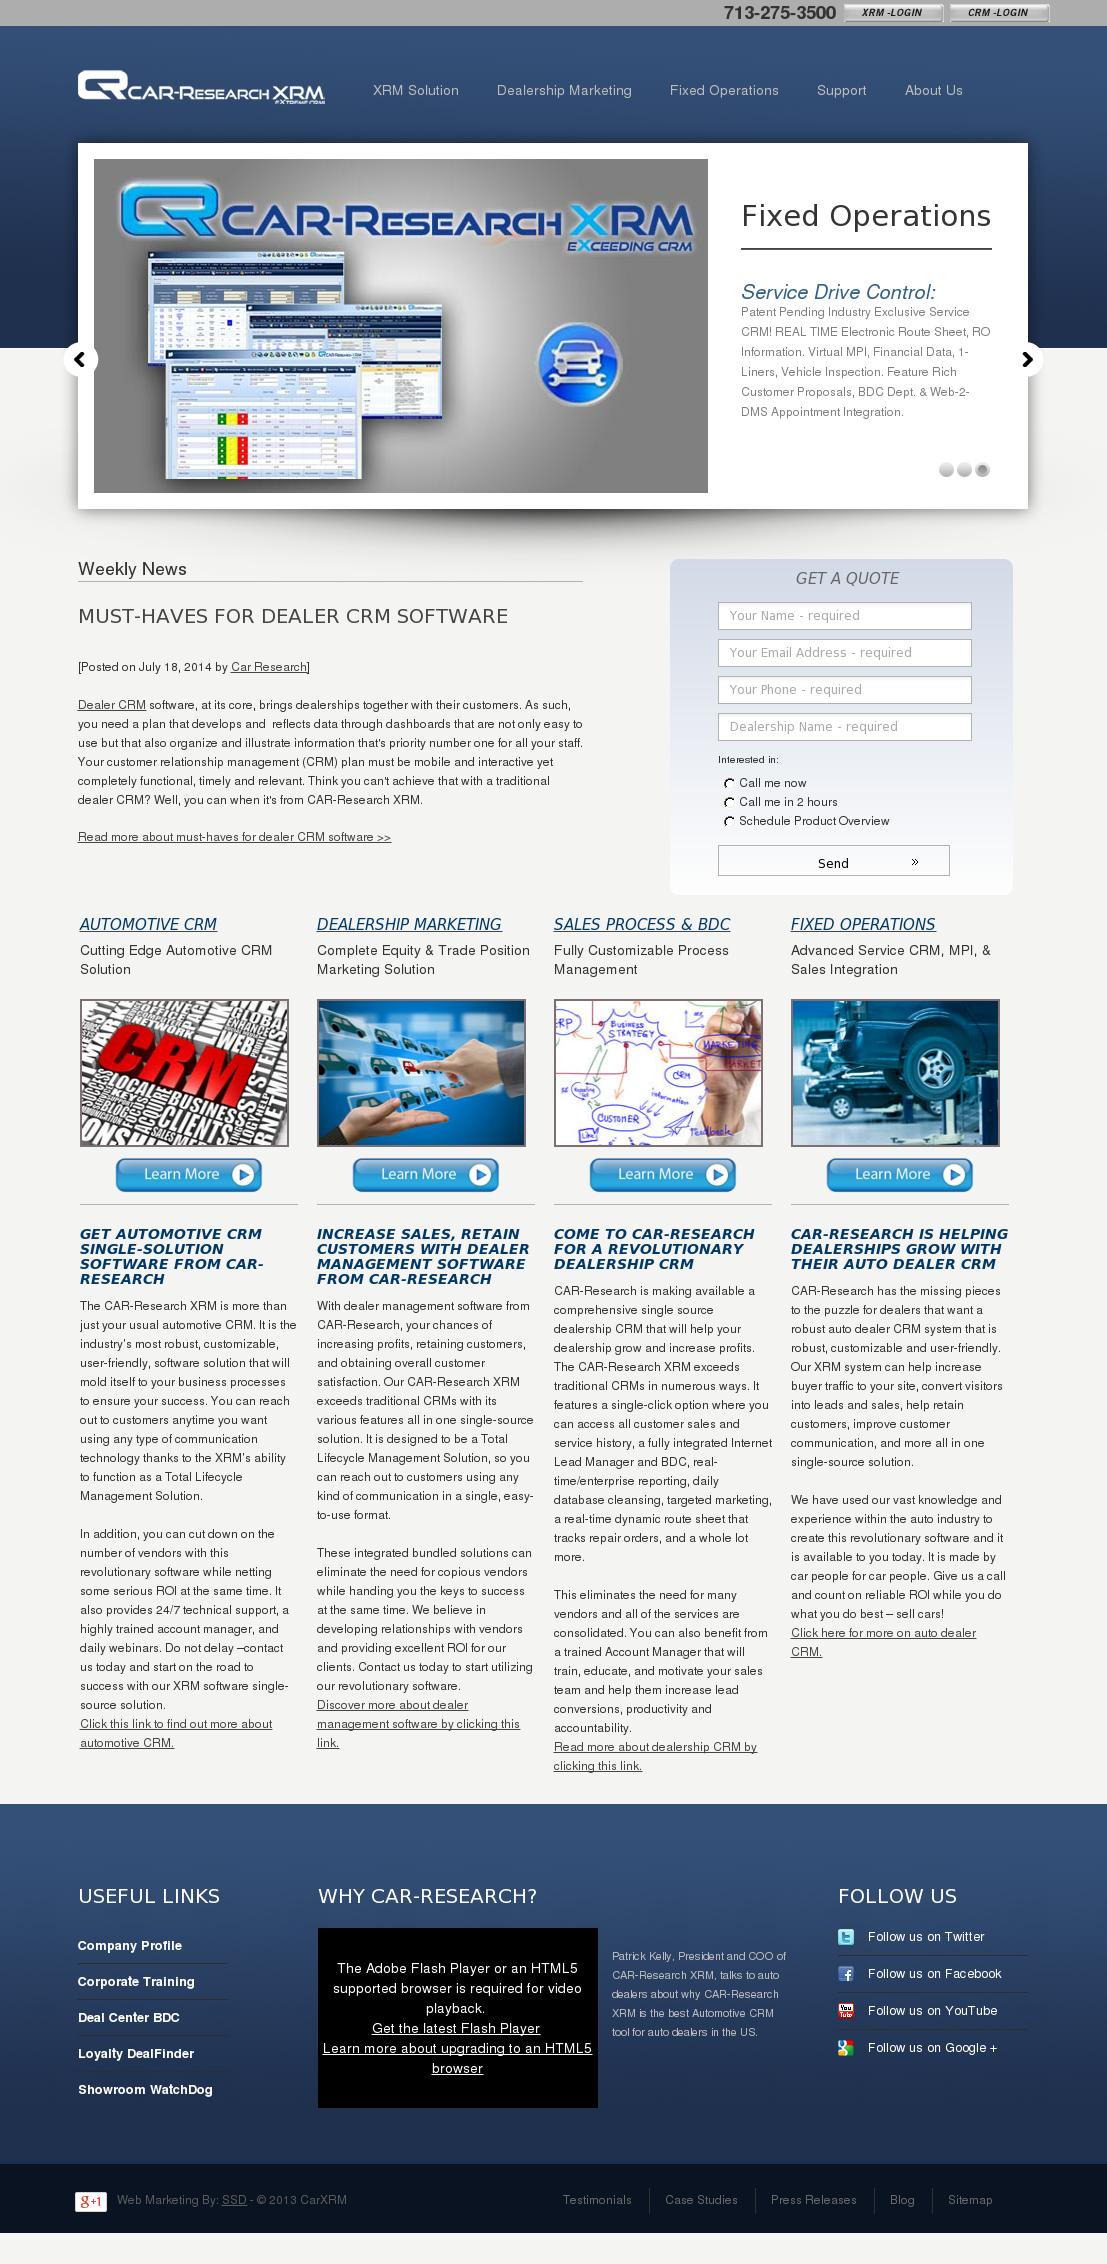 Car Research Xrm >> Car-research Xrm Company Profile | Owler